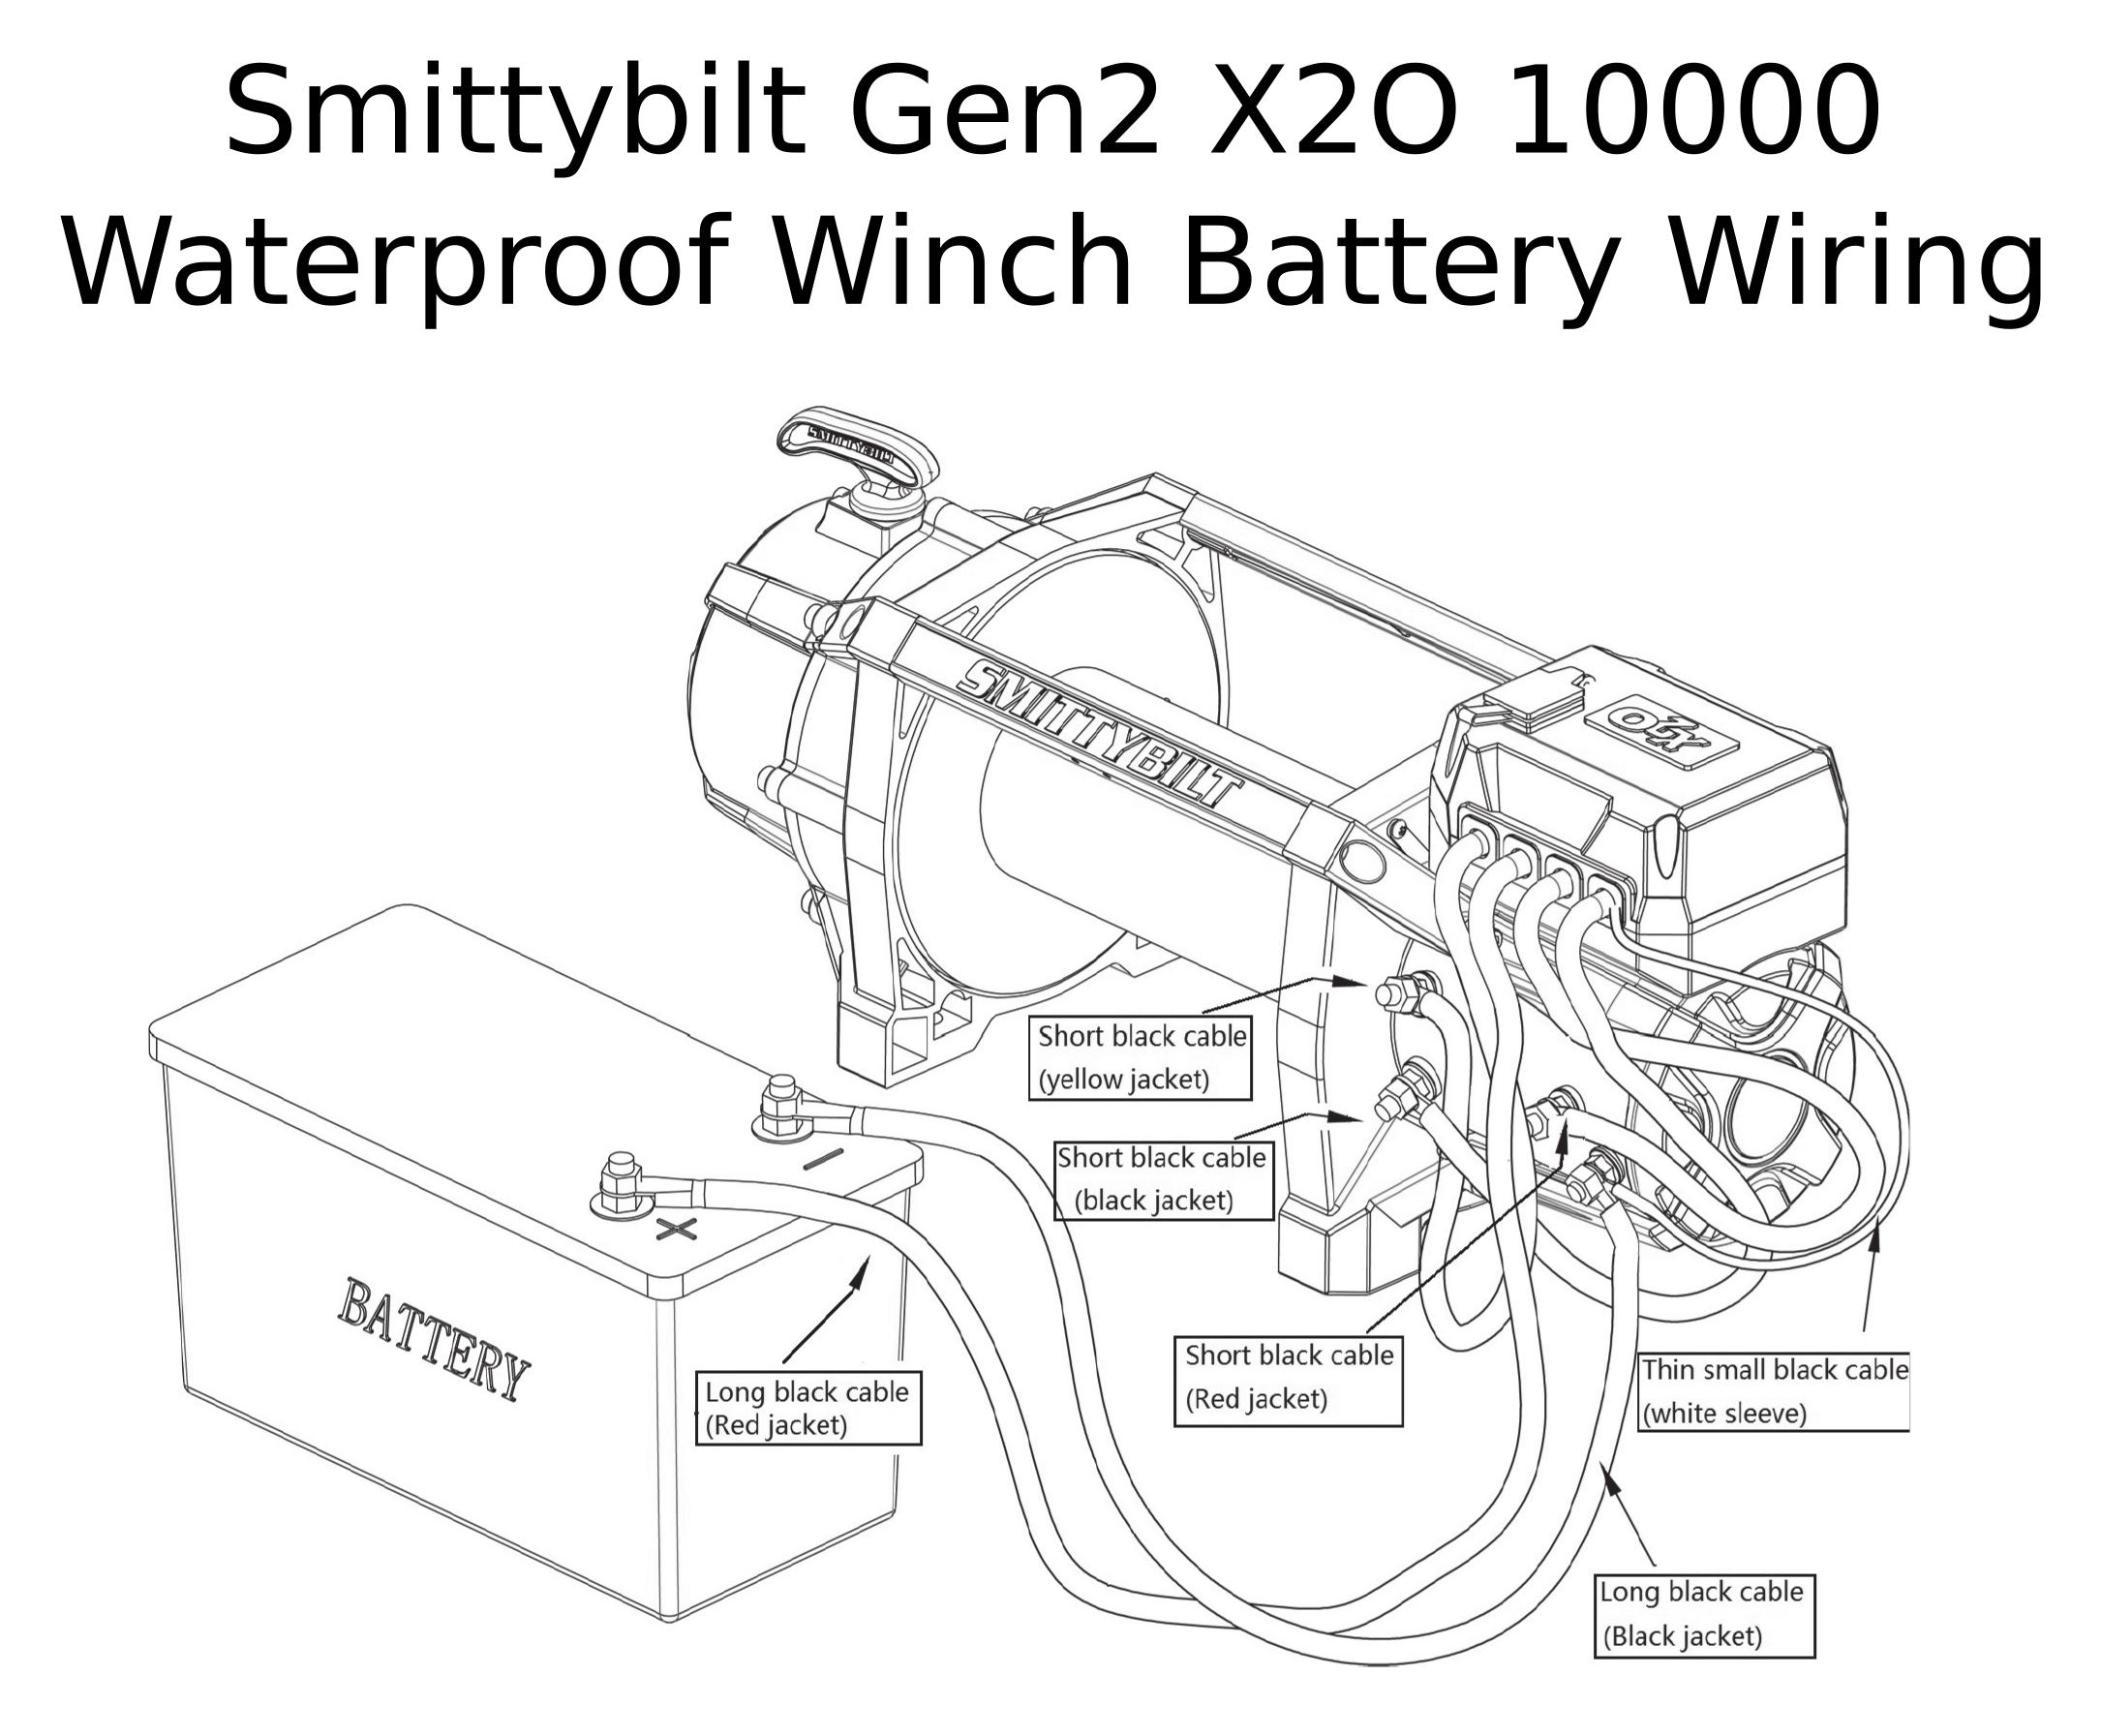 [Complete Specs] Smittybilt Gen2 X2O 10000 Waterproof